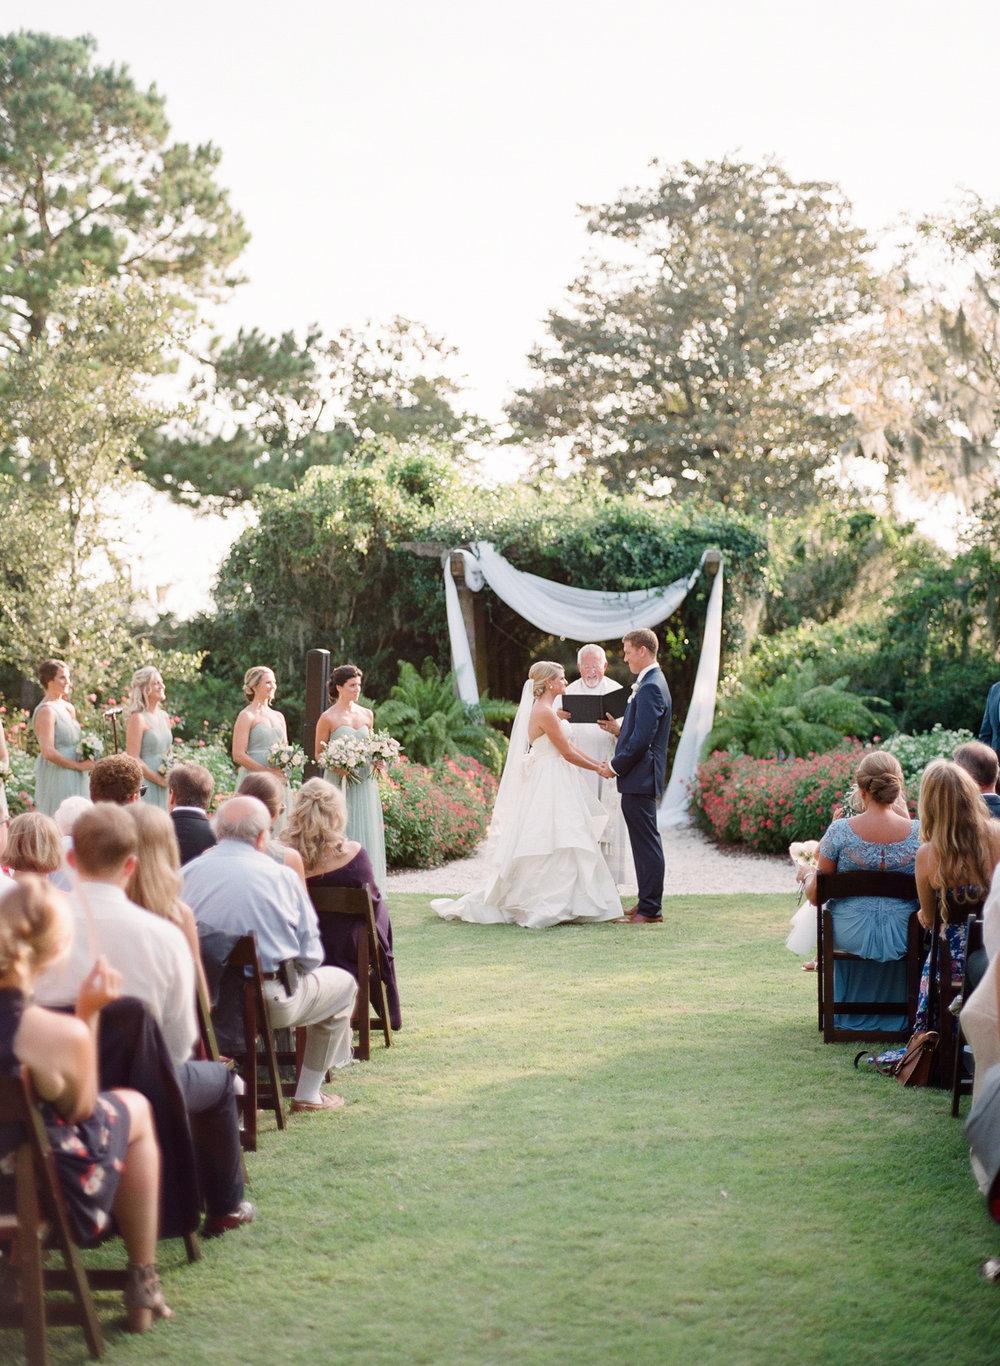 Airlie-Gardens-Wedding-40.jpg